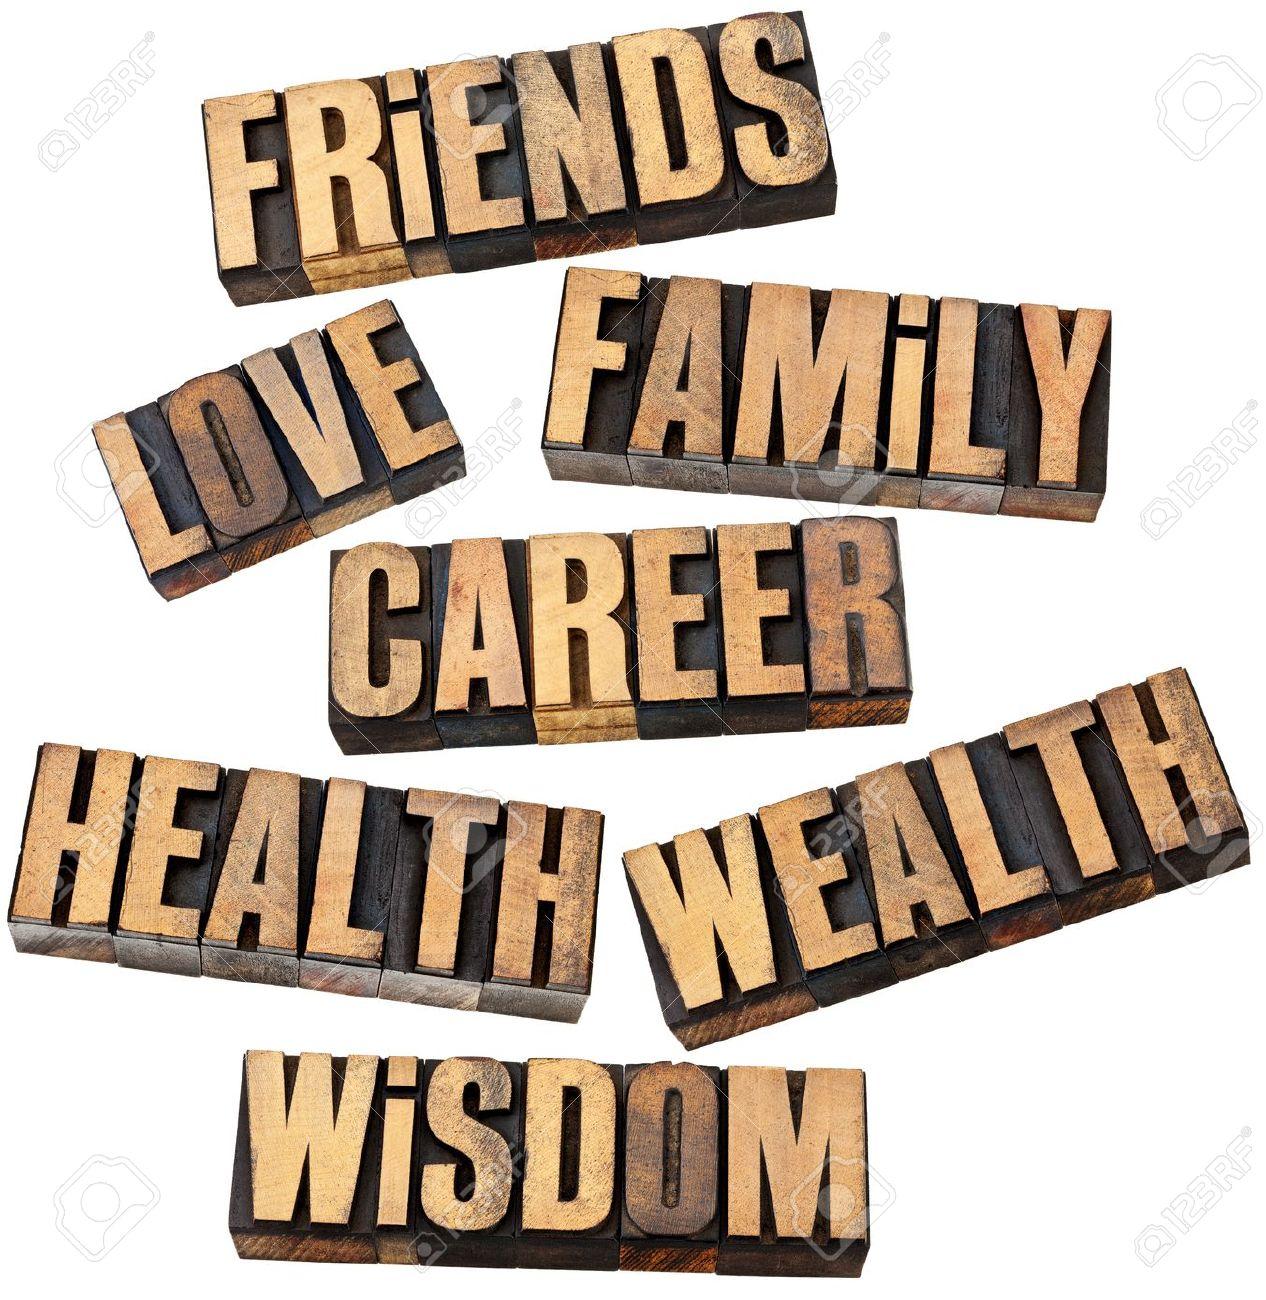 Career family wealth love friends health wisdom list stock career family wealth love friends health wisdom list of publicscrutiny Choice Image